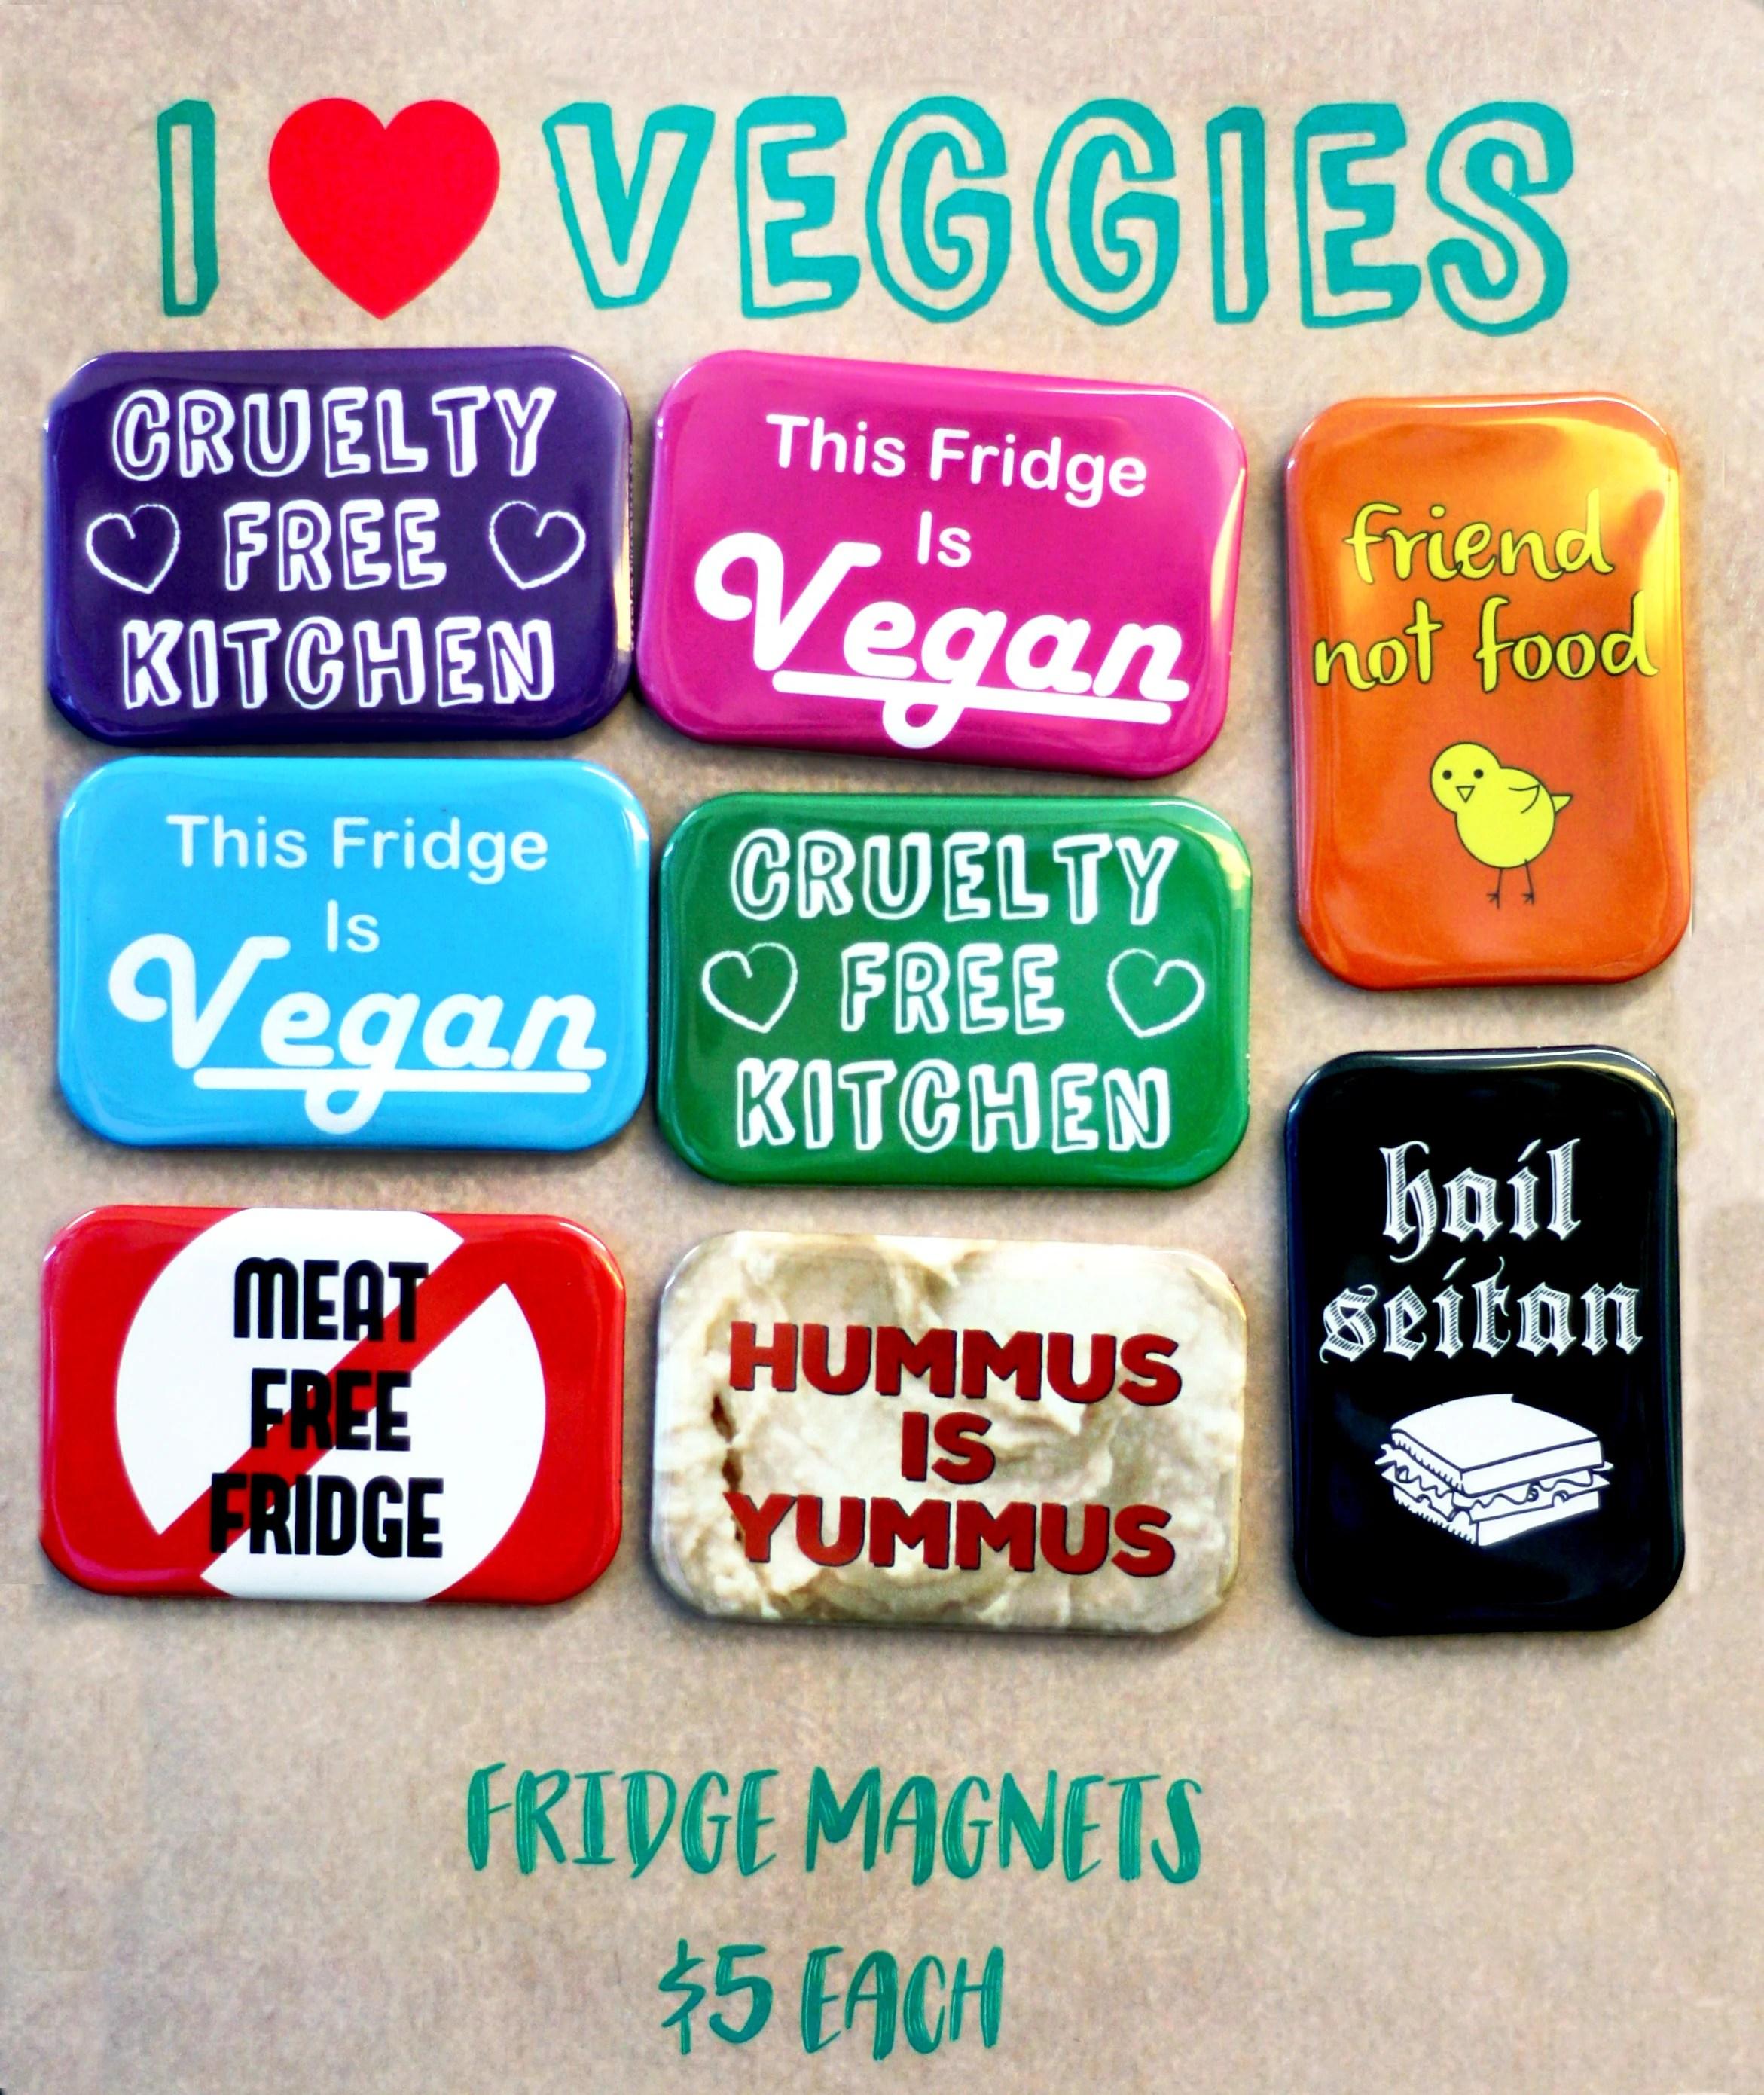 kitchen magnets popular paint colors for kitchens i heart veggies fridge people power press custom